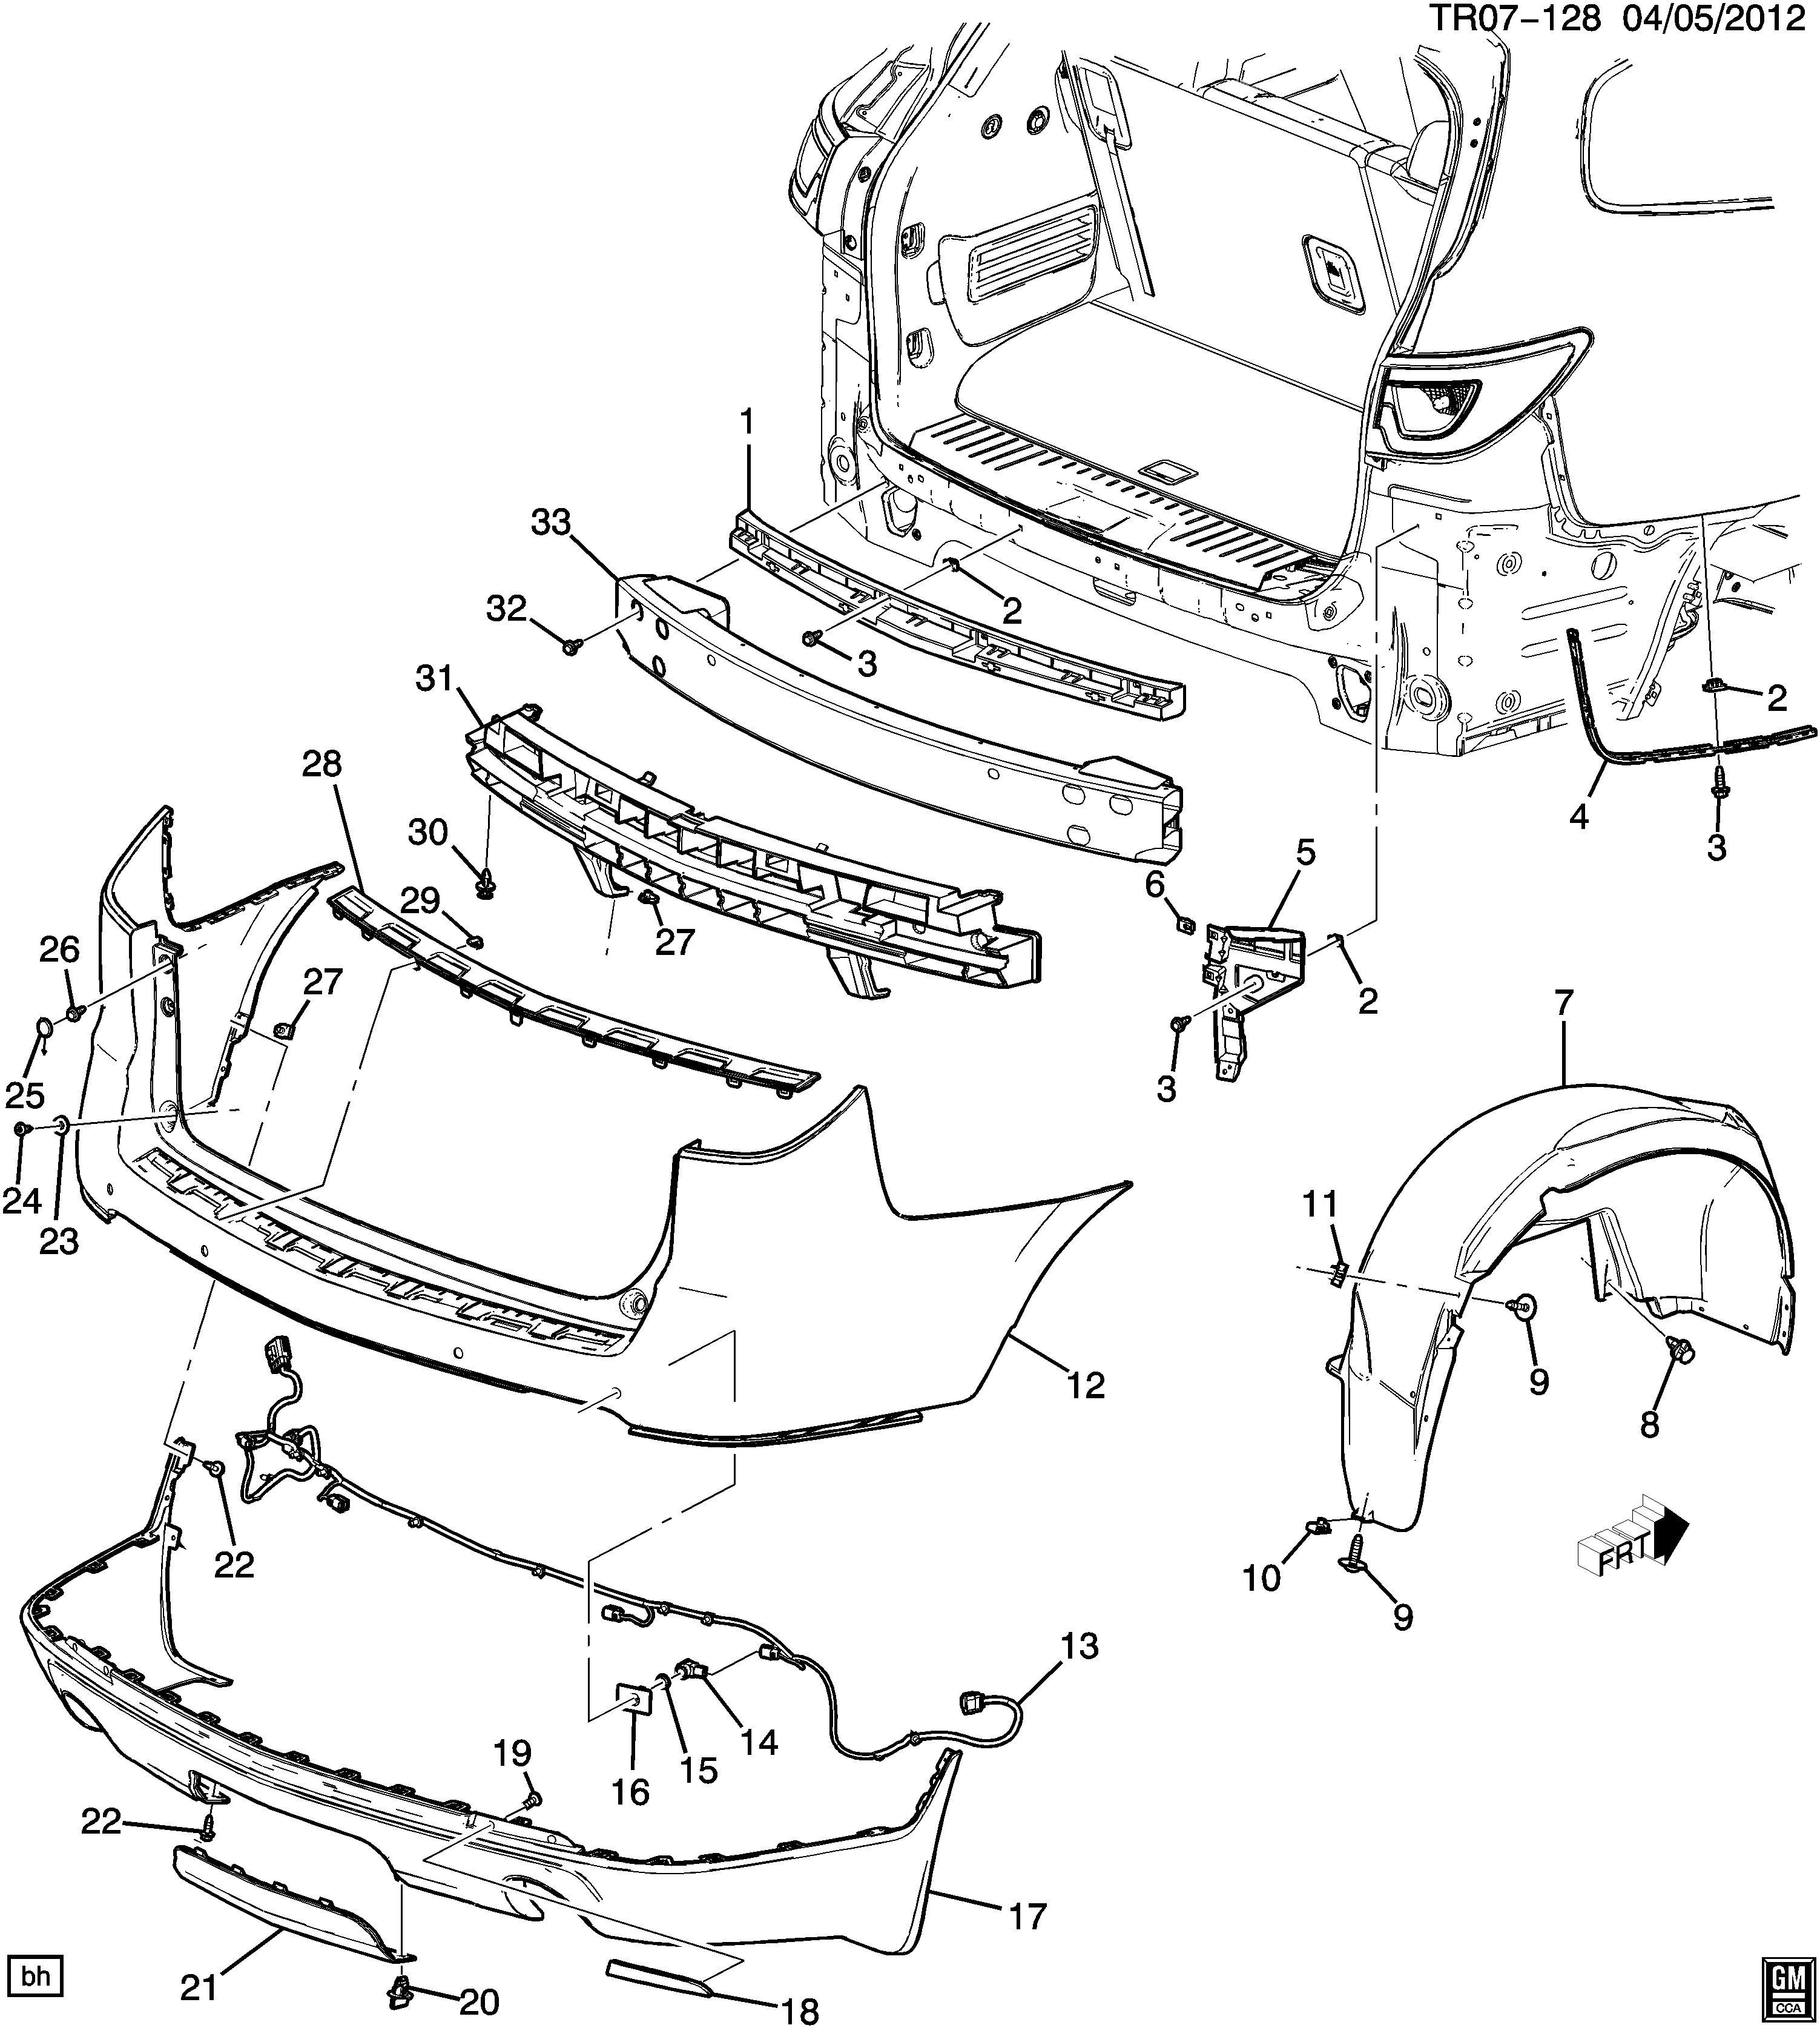 Chevrolet Traverse Cover. Front and rear bumper/fascia